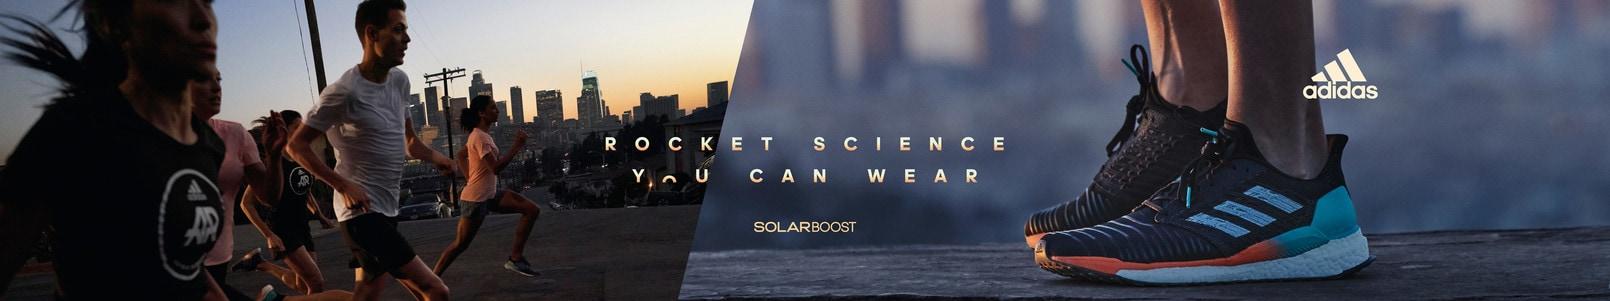 solarboost